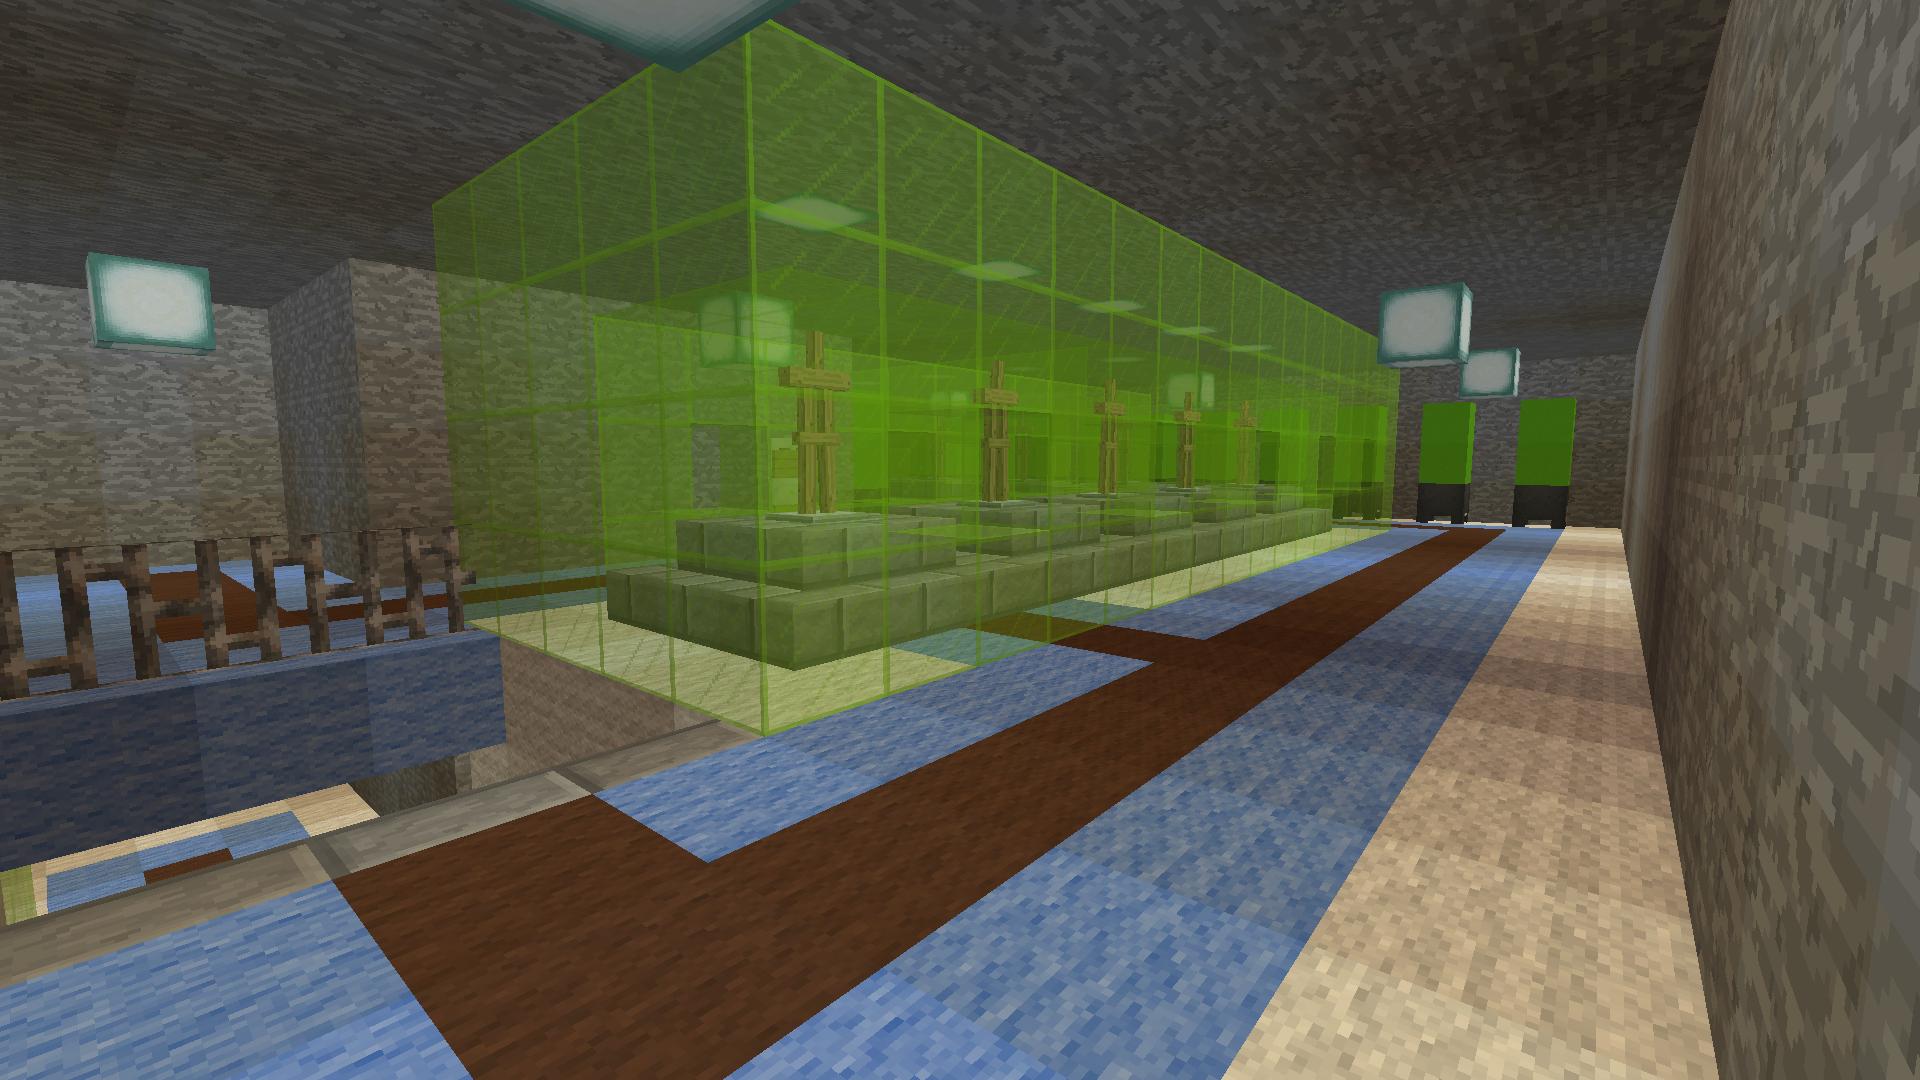 NbaNga's Lab скриншот 3